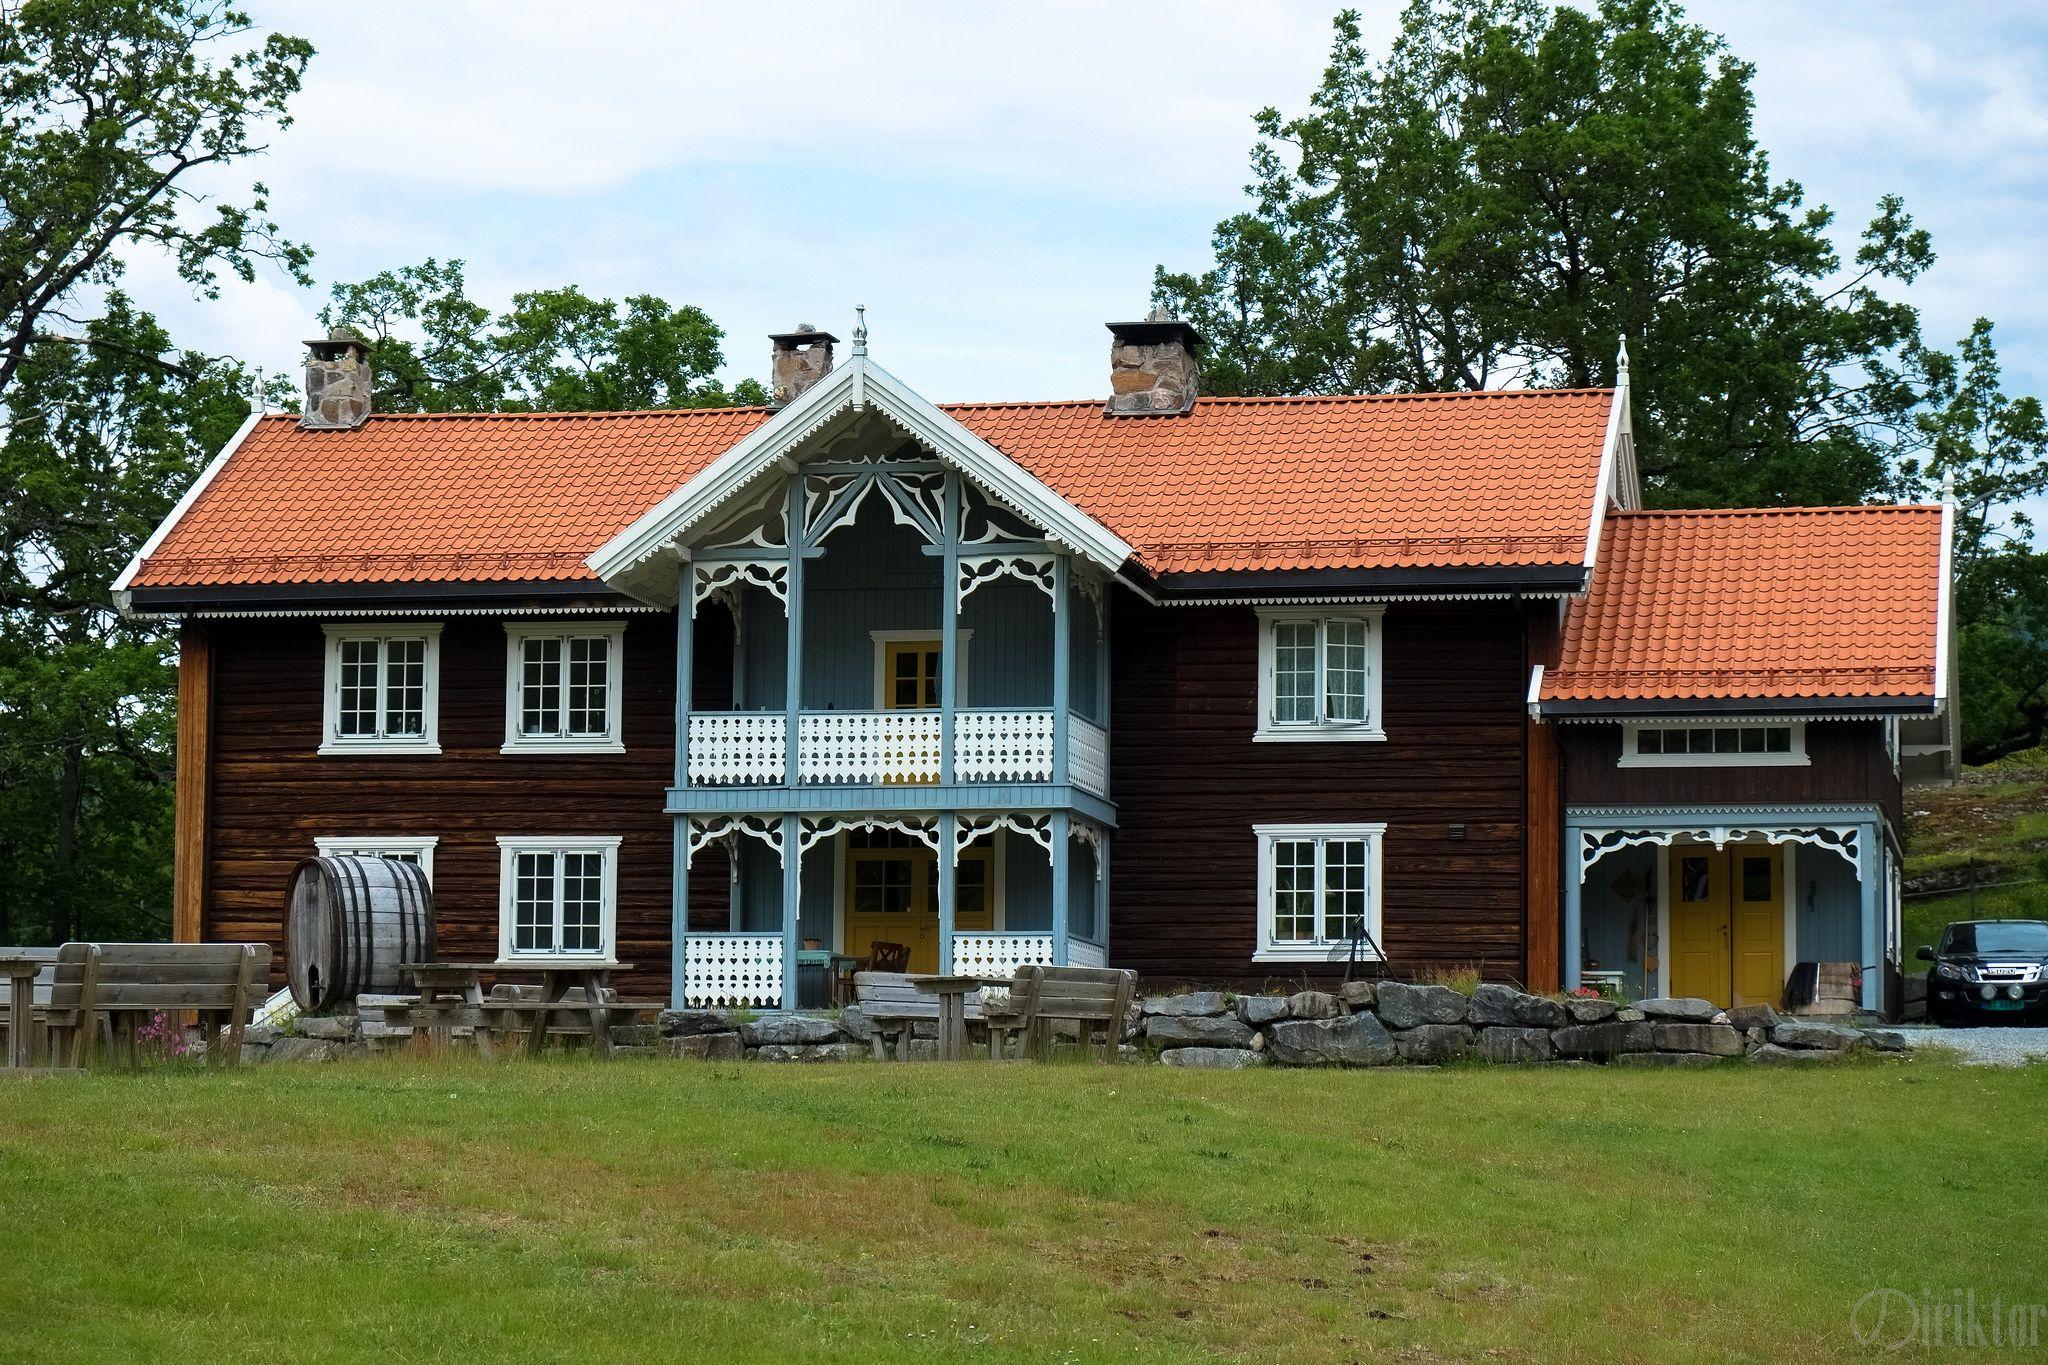 Veikåker gård | Vernacular architecture on norwegian farm life, norwegian apartment, norwegian open sandwich, norwegian outhouse, norwegian homestead,